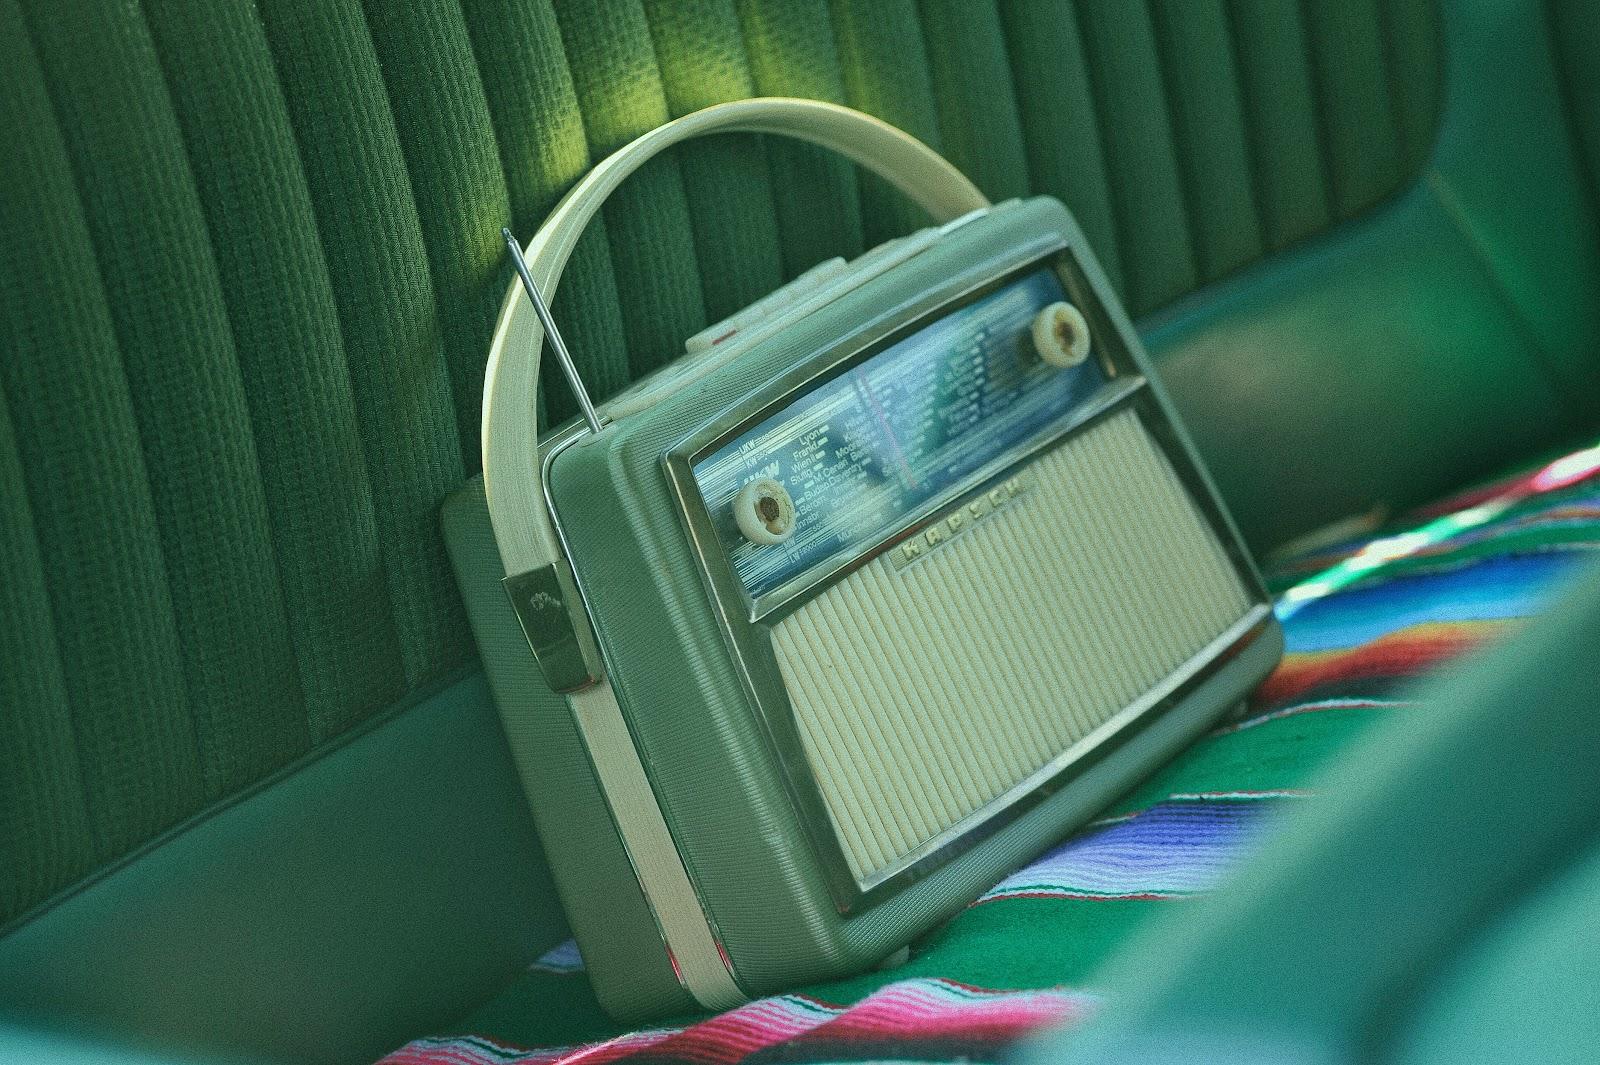 Old Cassette Radio